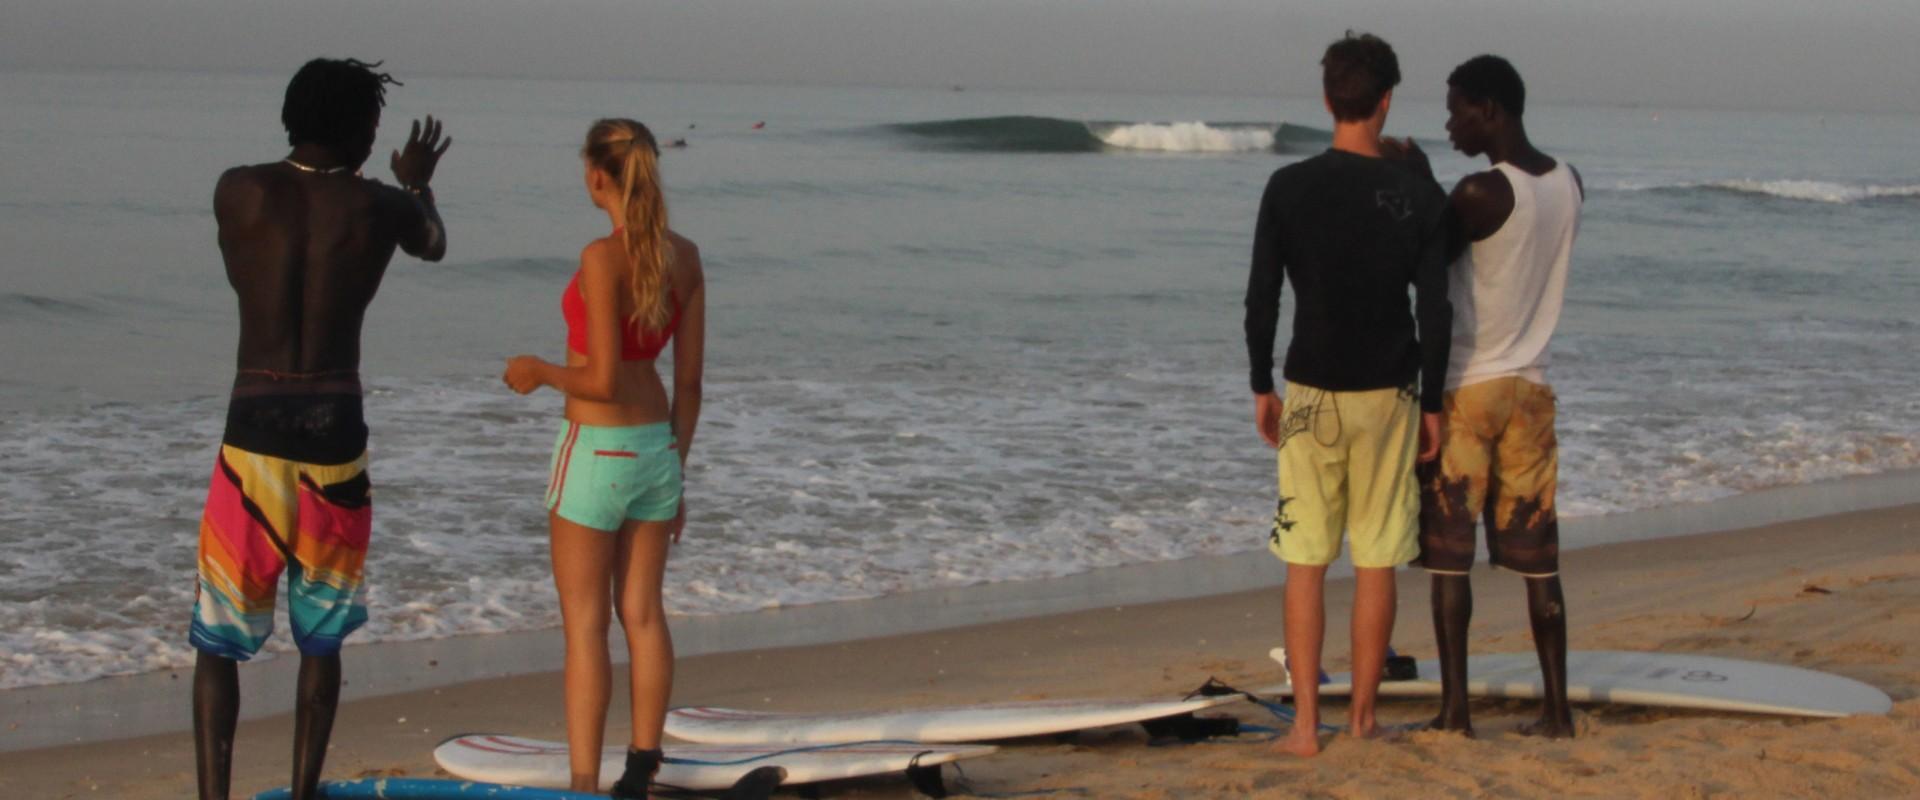 surf banner 3